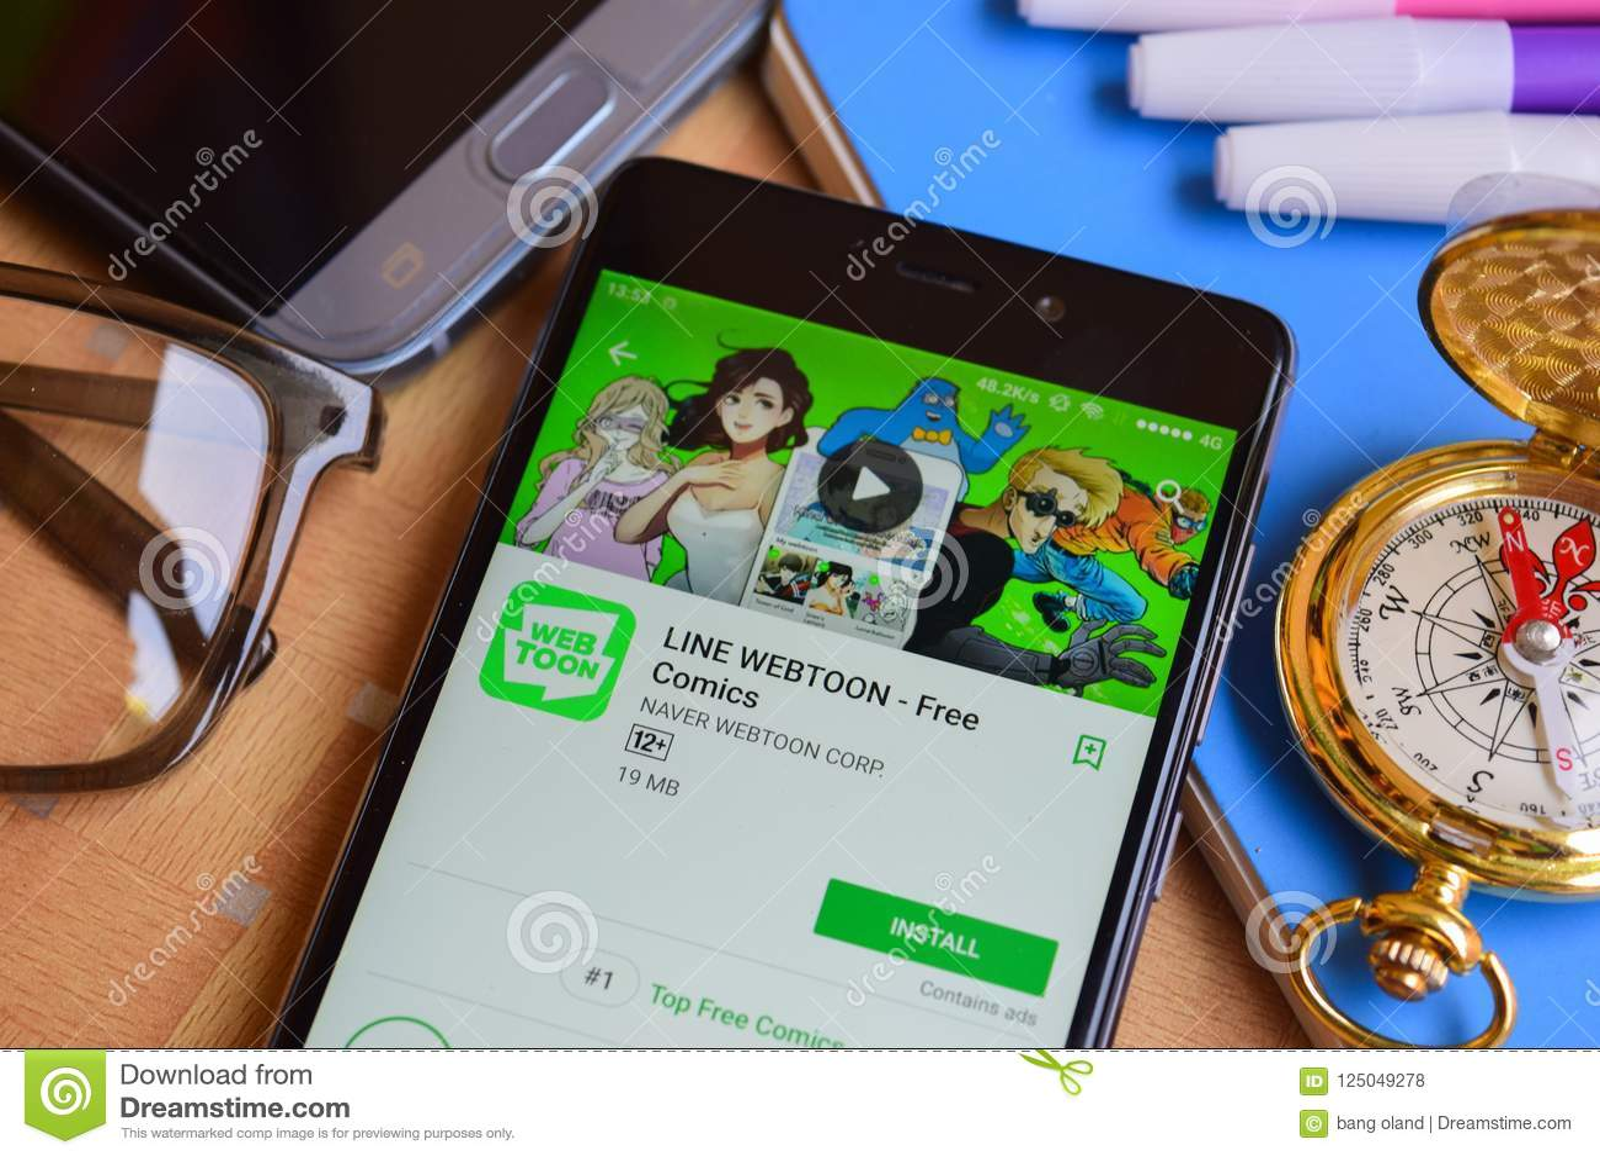 LINE WEBTOON - Free Comics Dev Application On Smartphone Screen